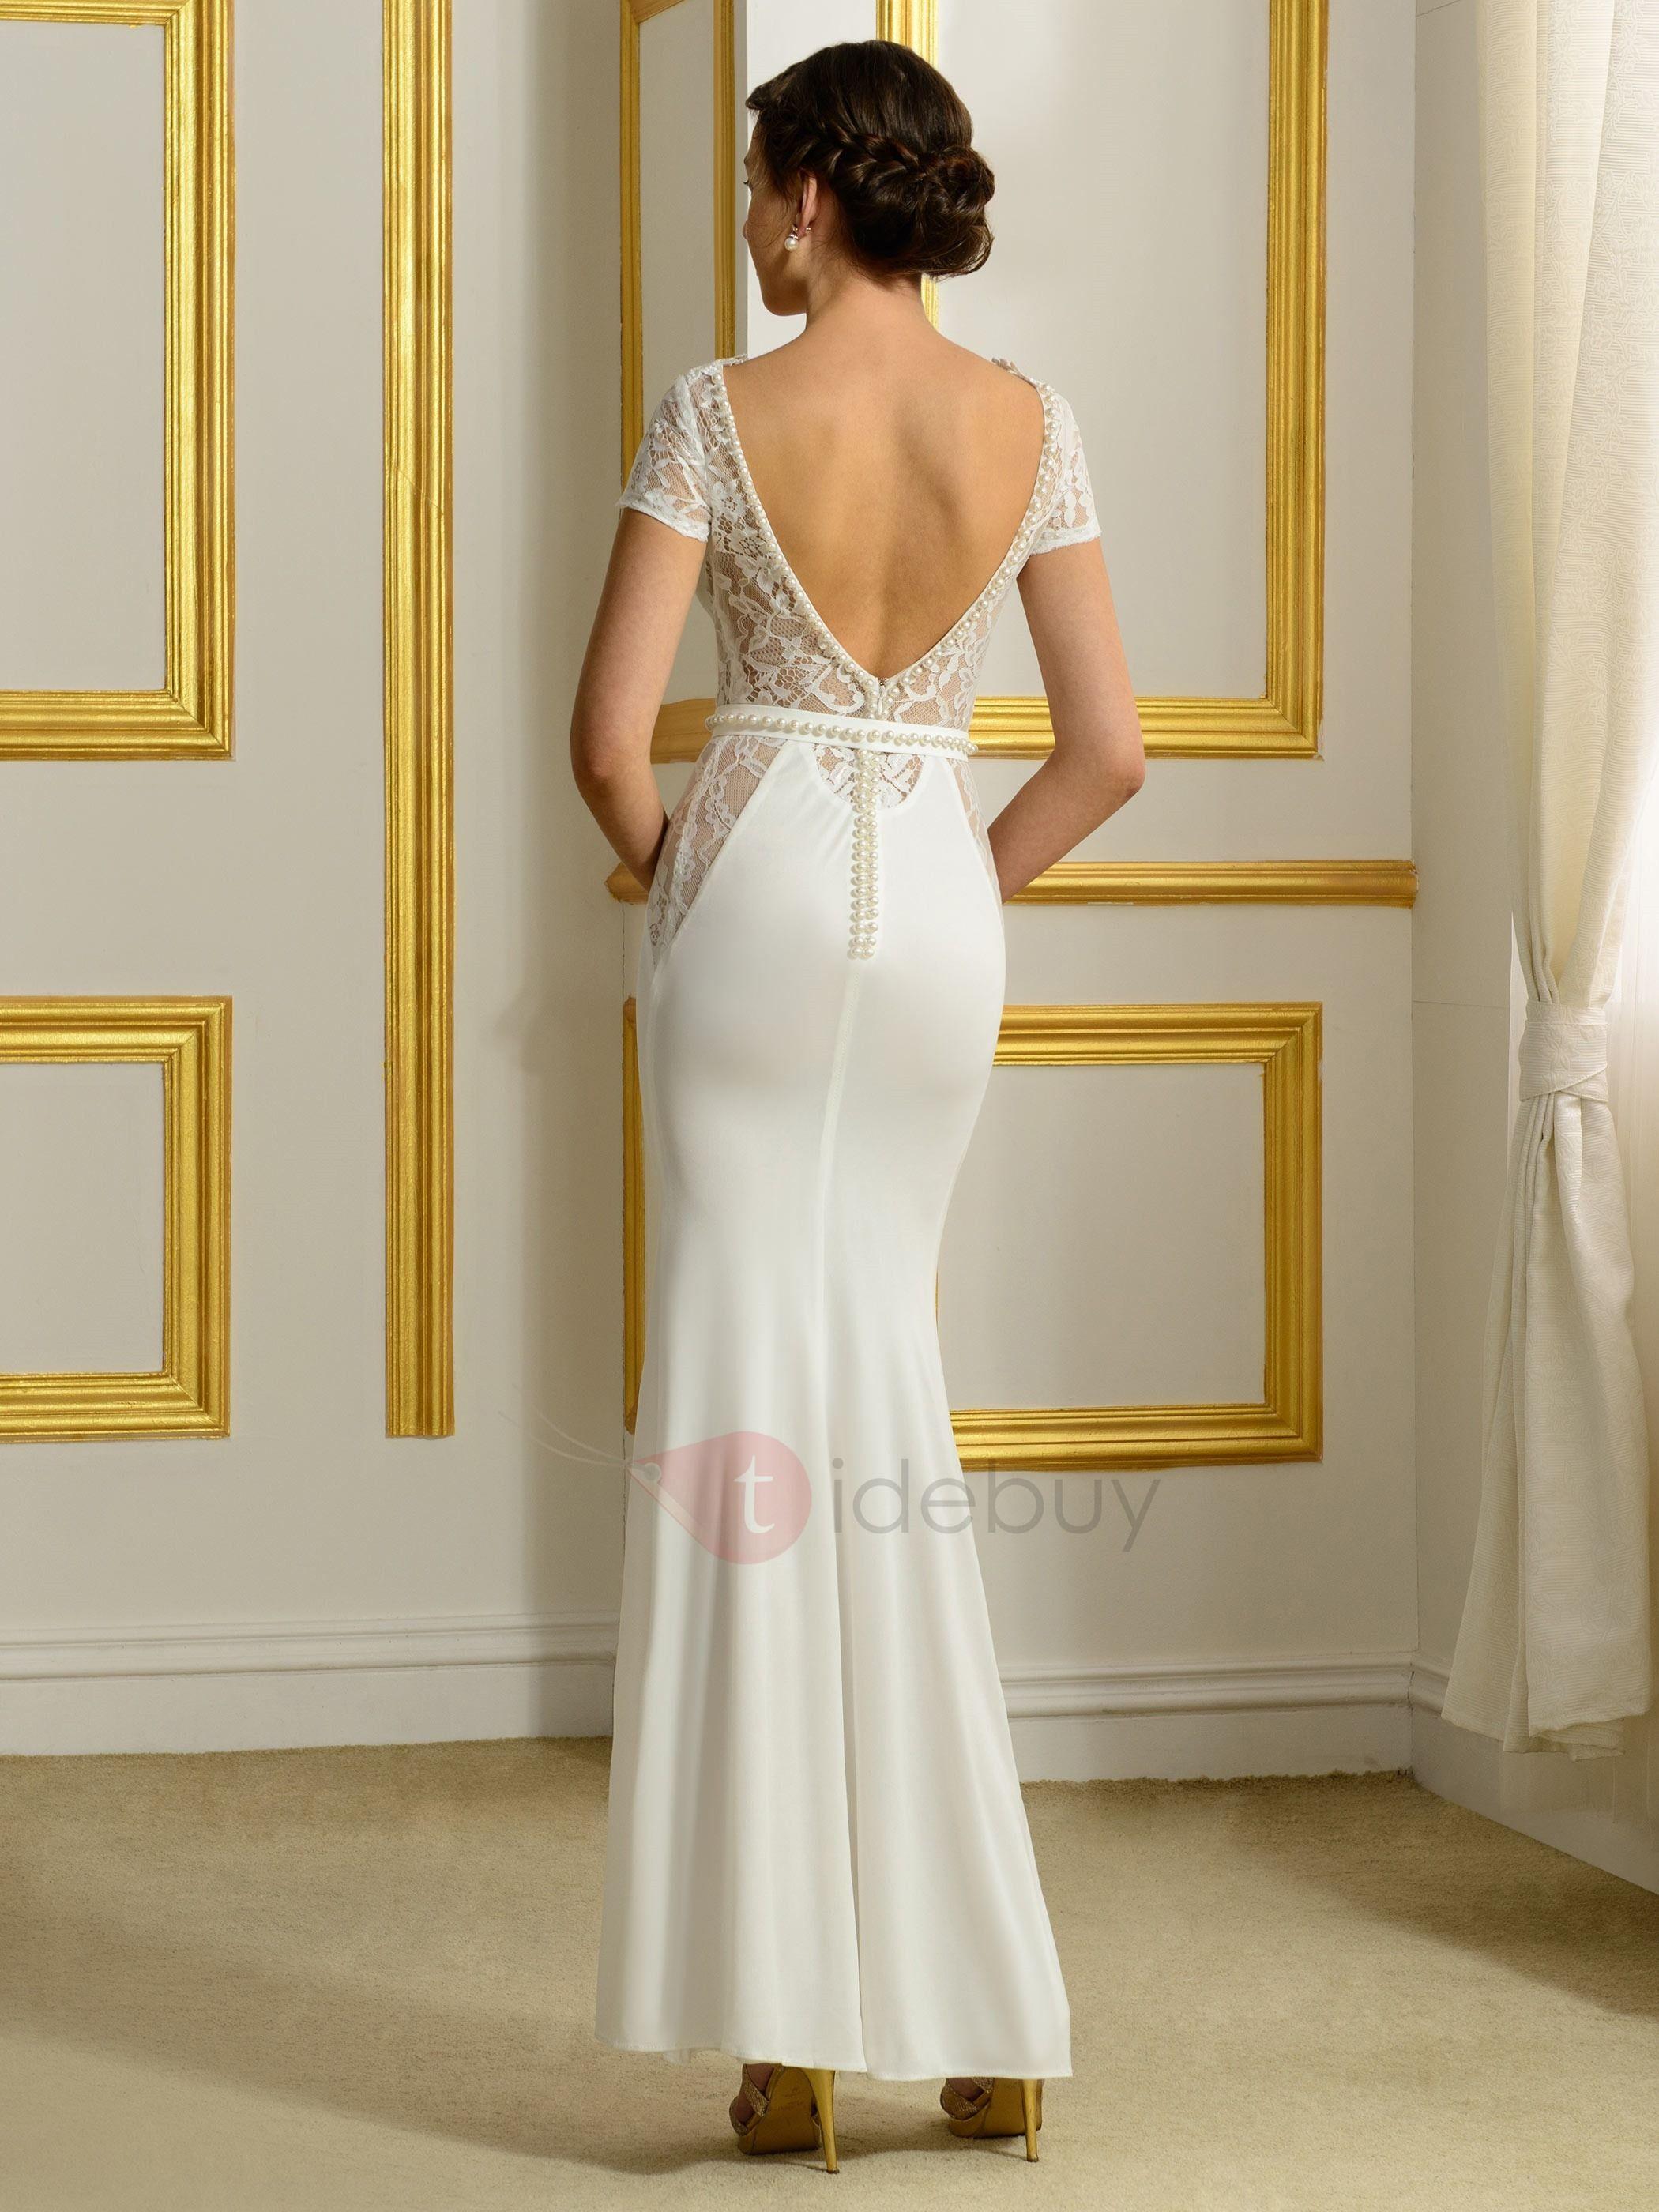 Sexy v neck backless sheath wedding dress wedding dress wedding